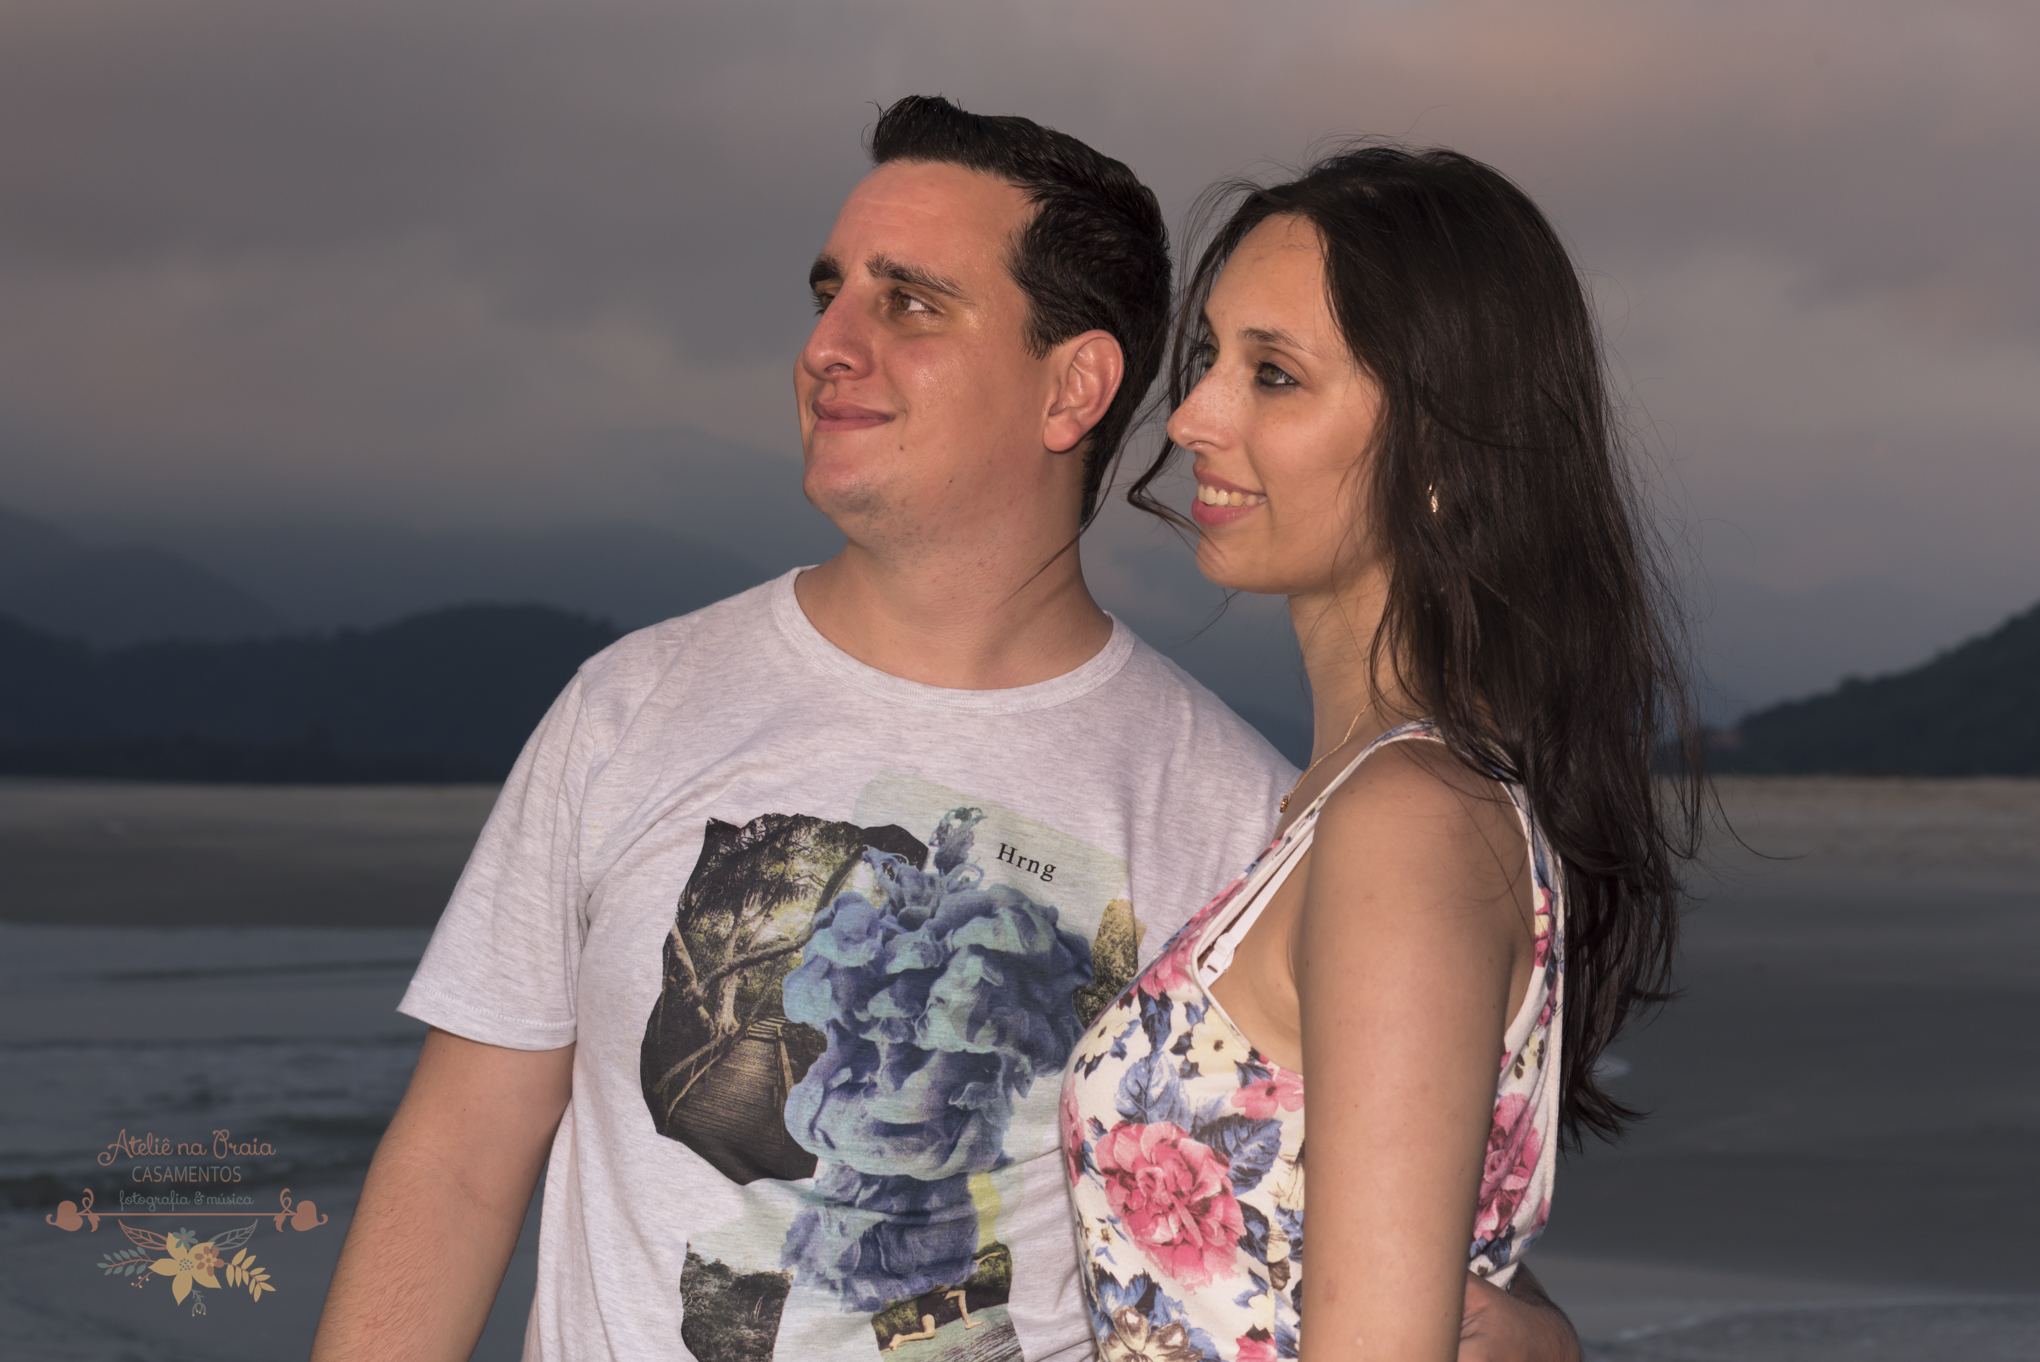 Atelie-na-Praia-Pre-Wedding-Thiesa-Bruno-PQ-2550